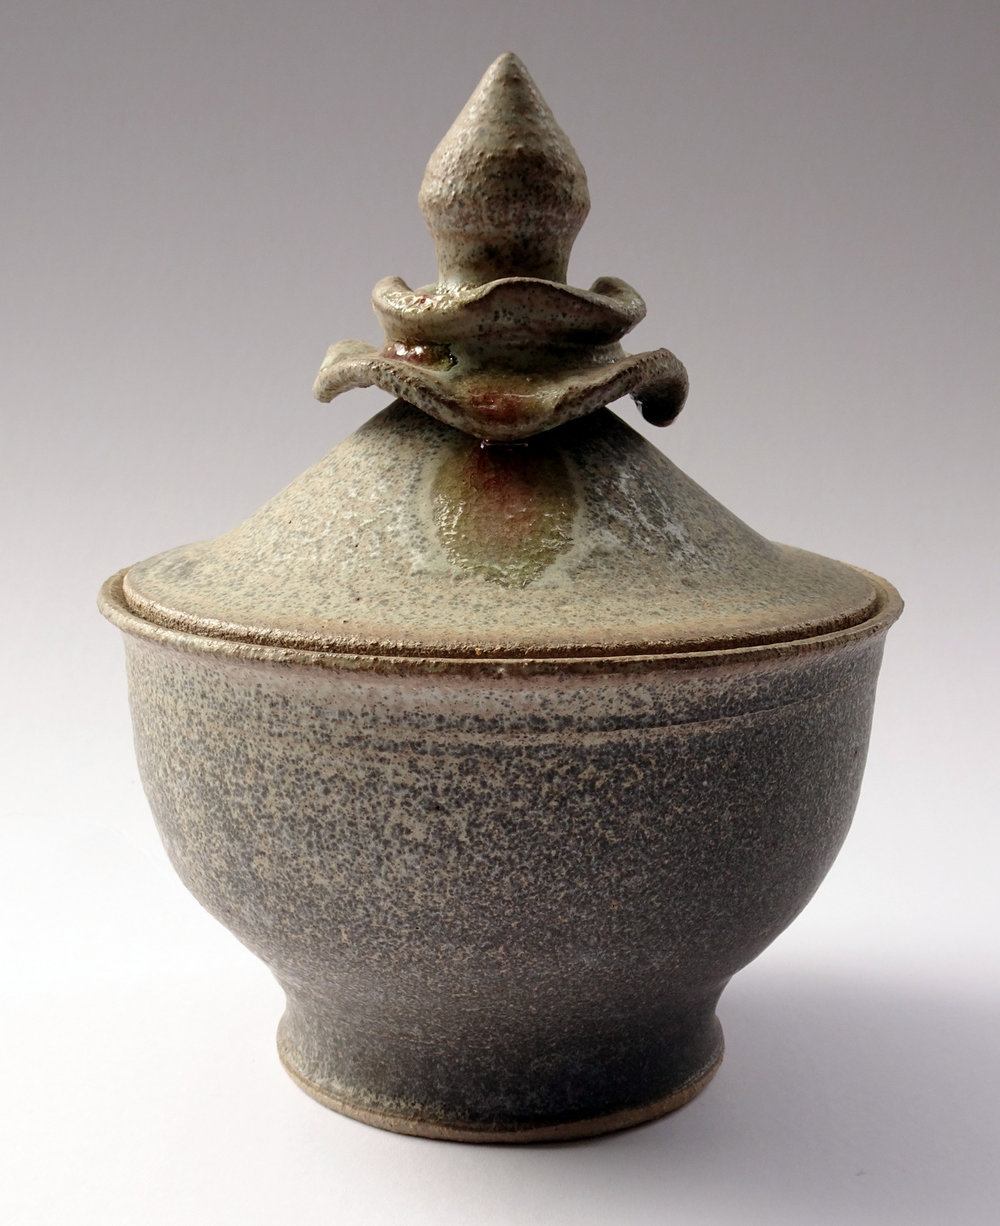 Atcha Turner, Ceramics-007.JPG